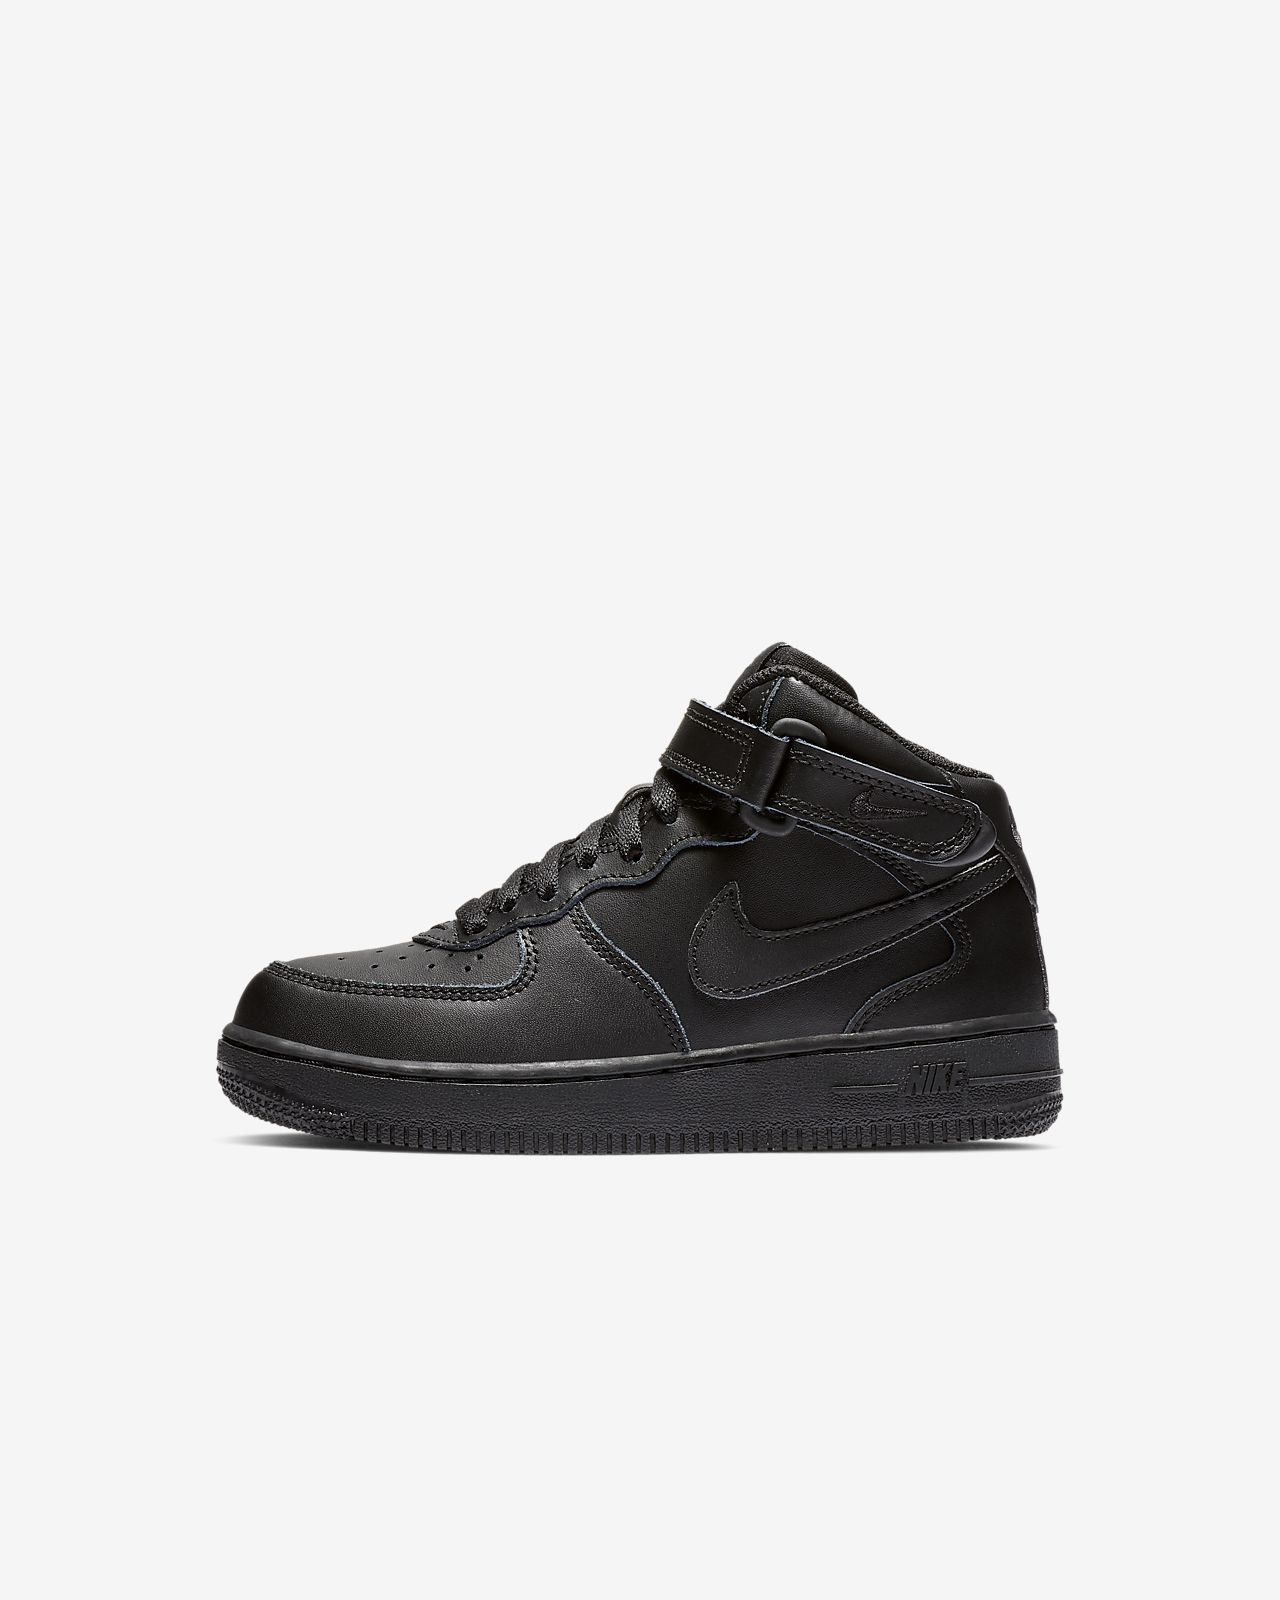 882c15966e5 Calzado para niños talla pequeña Nike Air Force 1 Mid. Nike.com CL